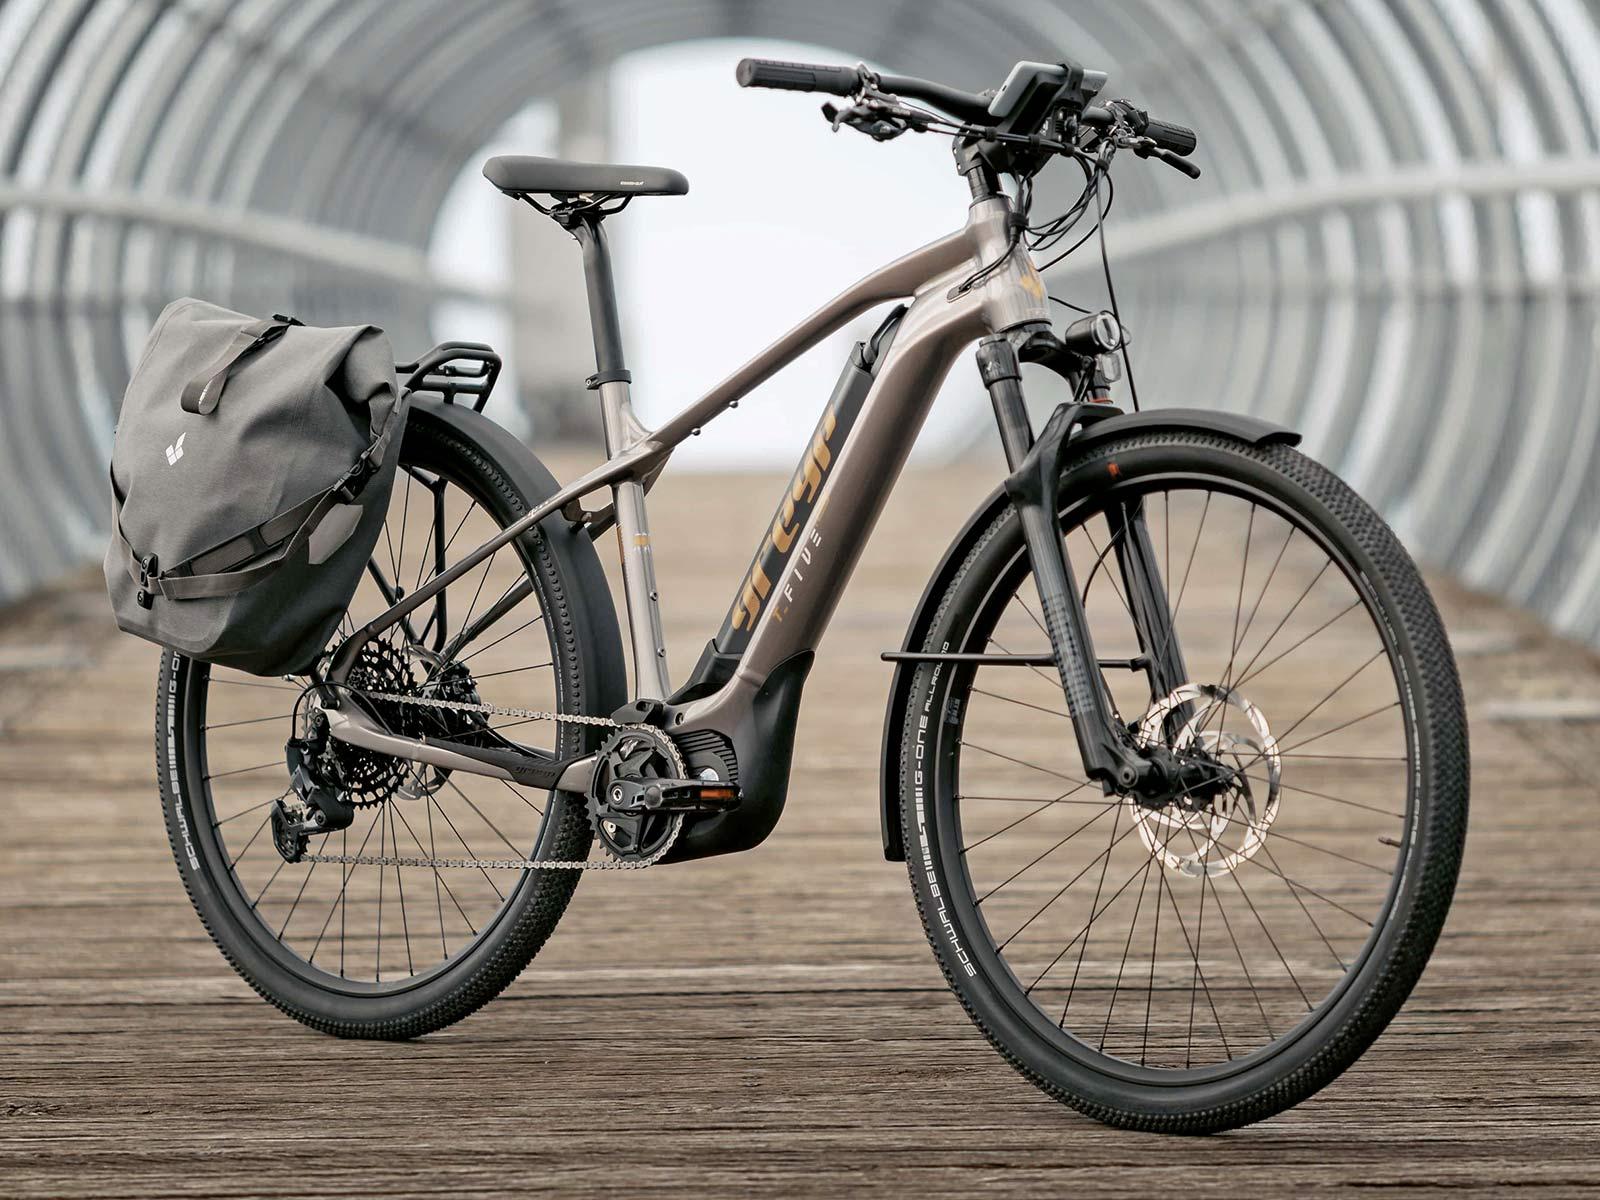 Greyp T5 alloy trekking e-bike hardtail eSUV commuter touring complete